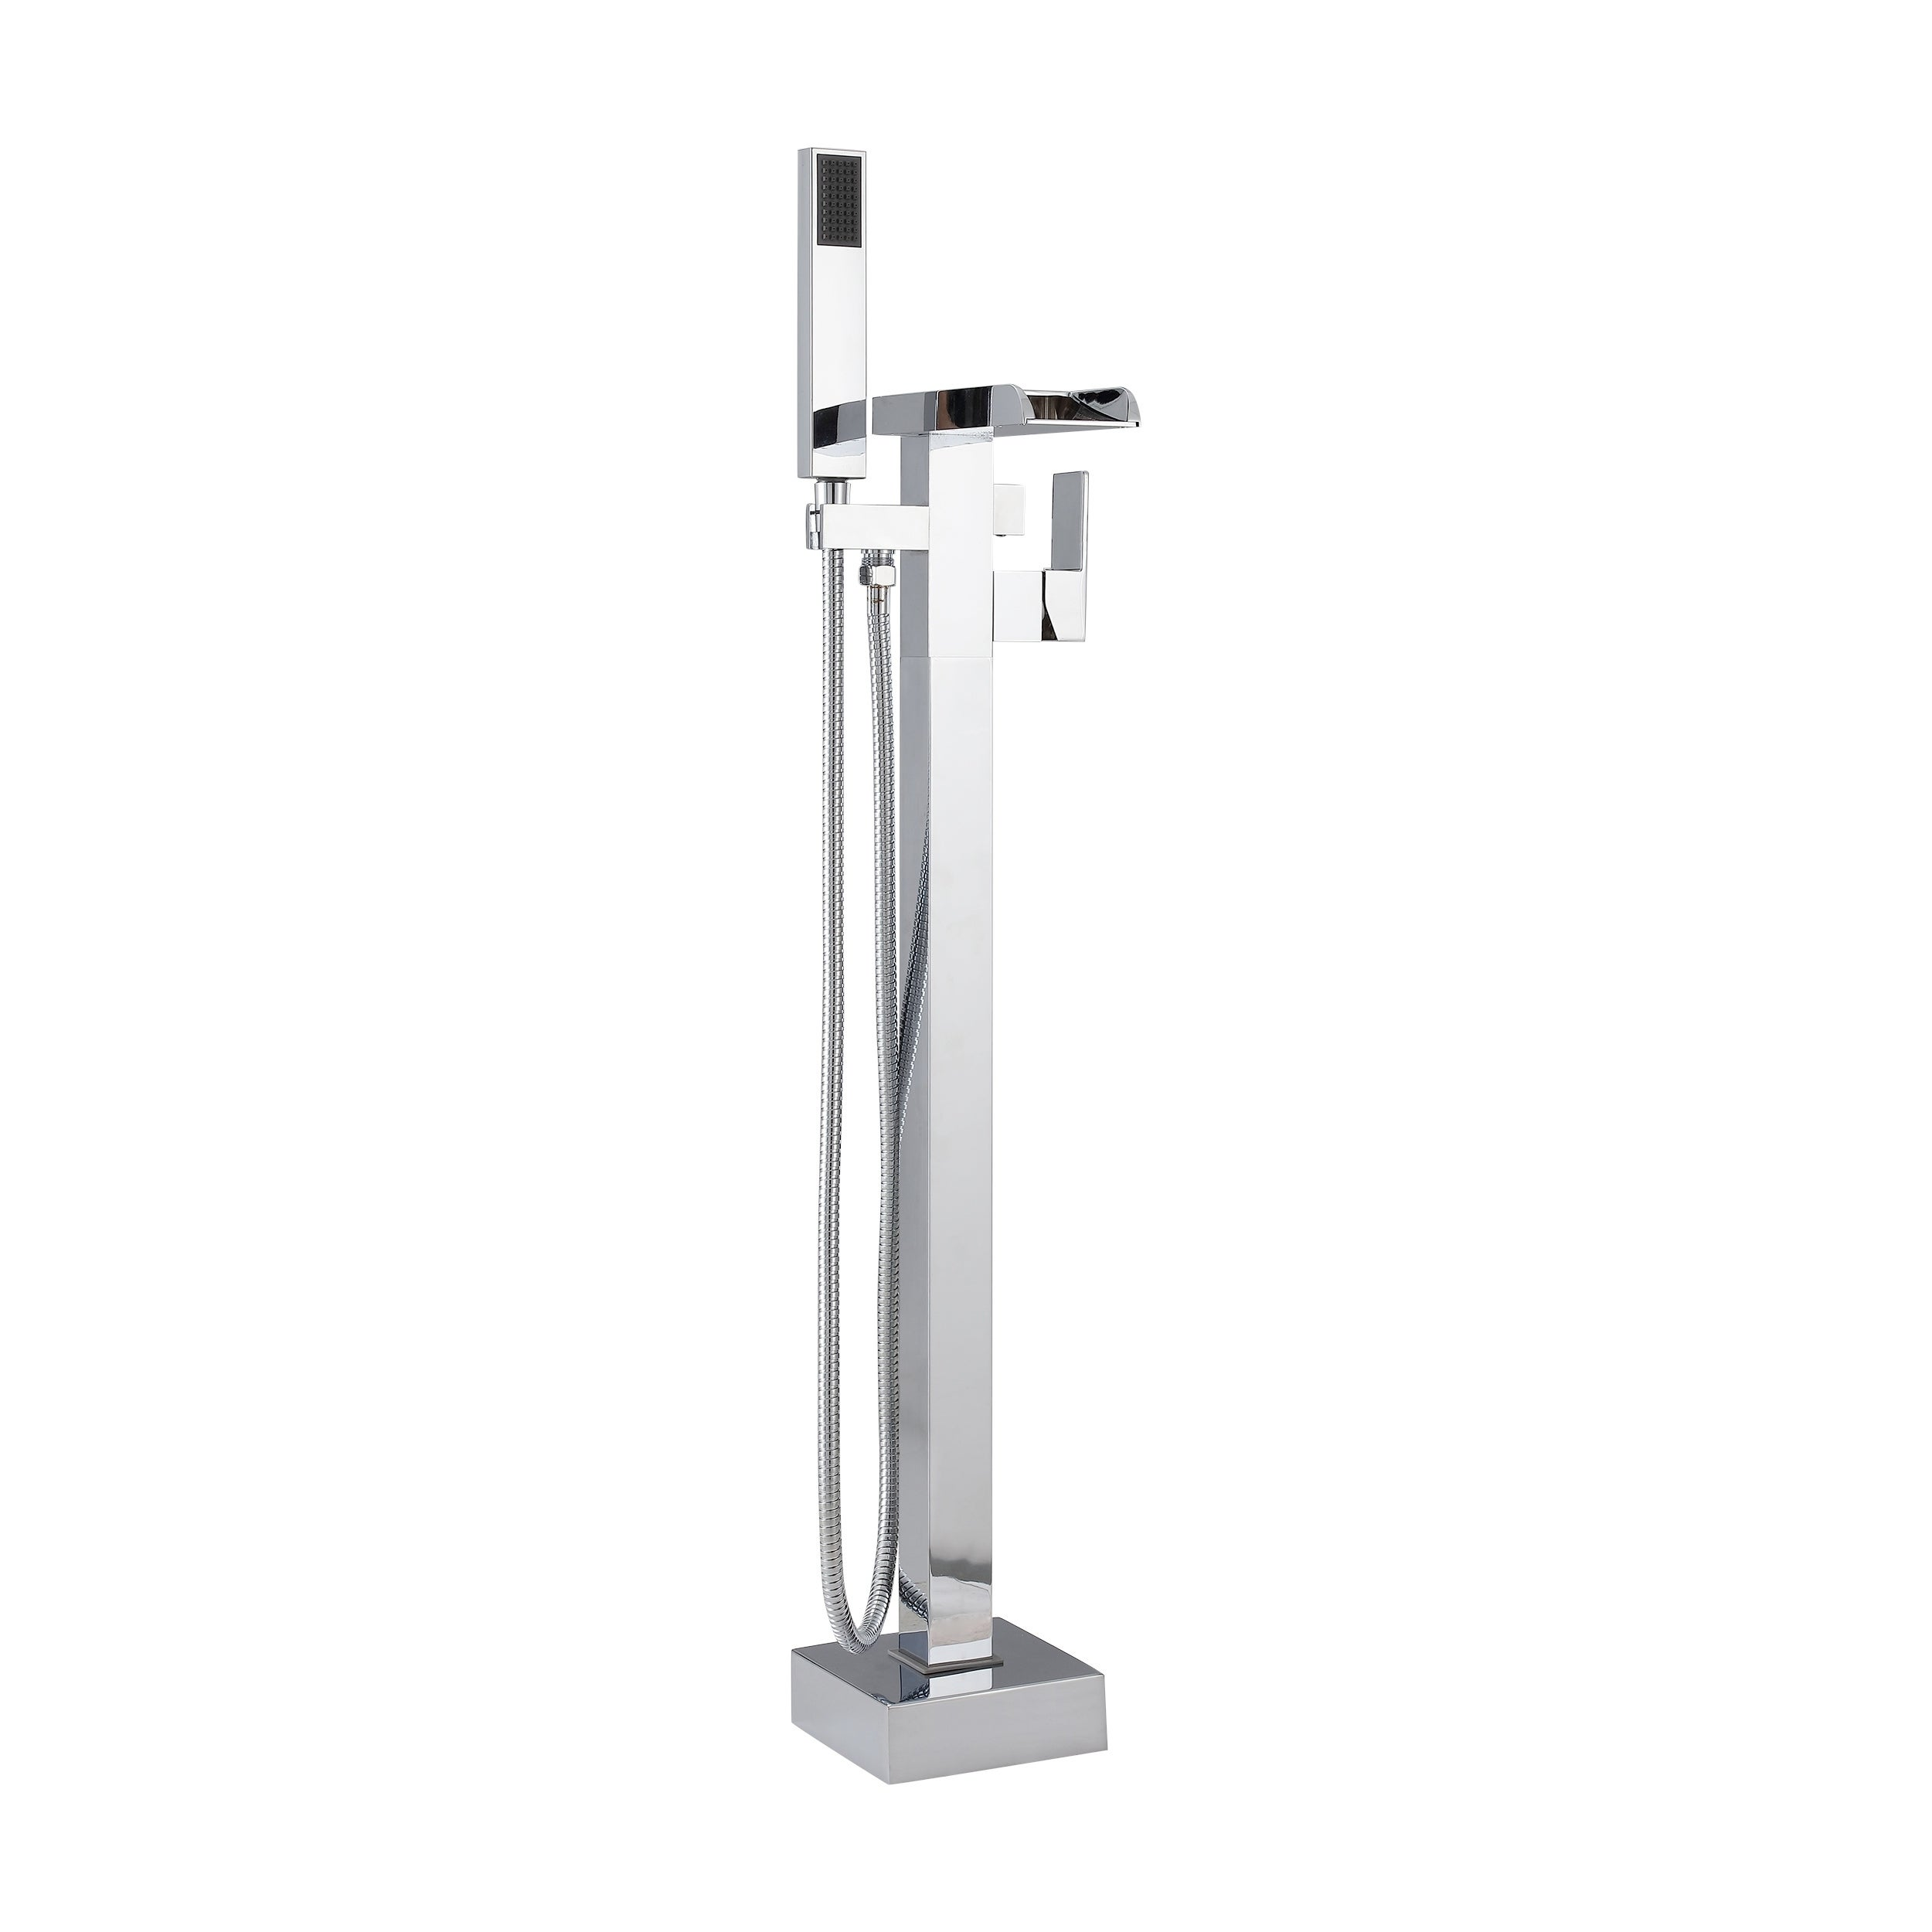 Shop Dima 1-Handle Freestanding Waterfall Tub Faucet & Handshower in ...